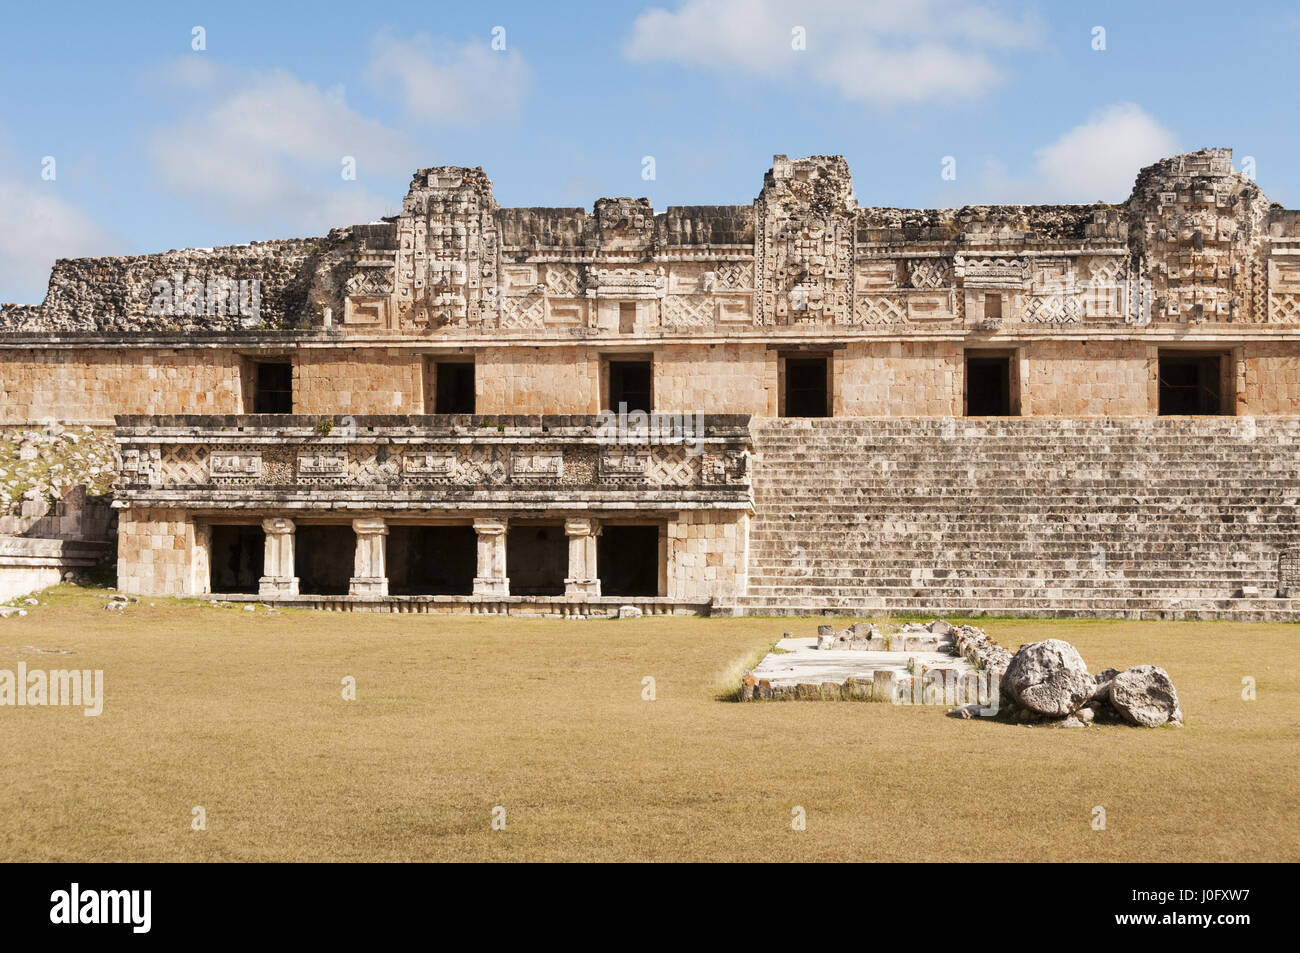 Mexico, Yucatan, Uxmal Mayan site, Nuns' Quadrangle, North Temple - Stock Image